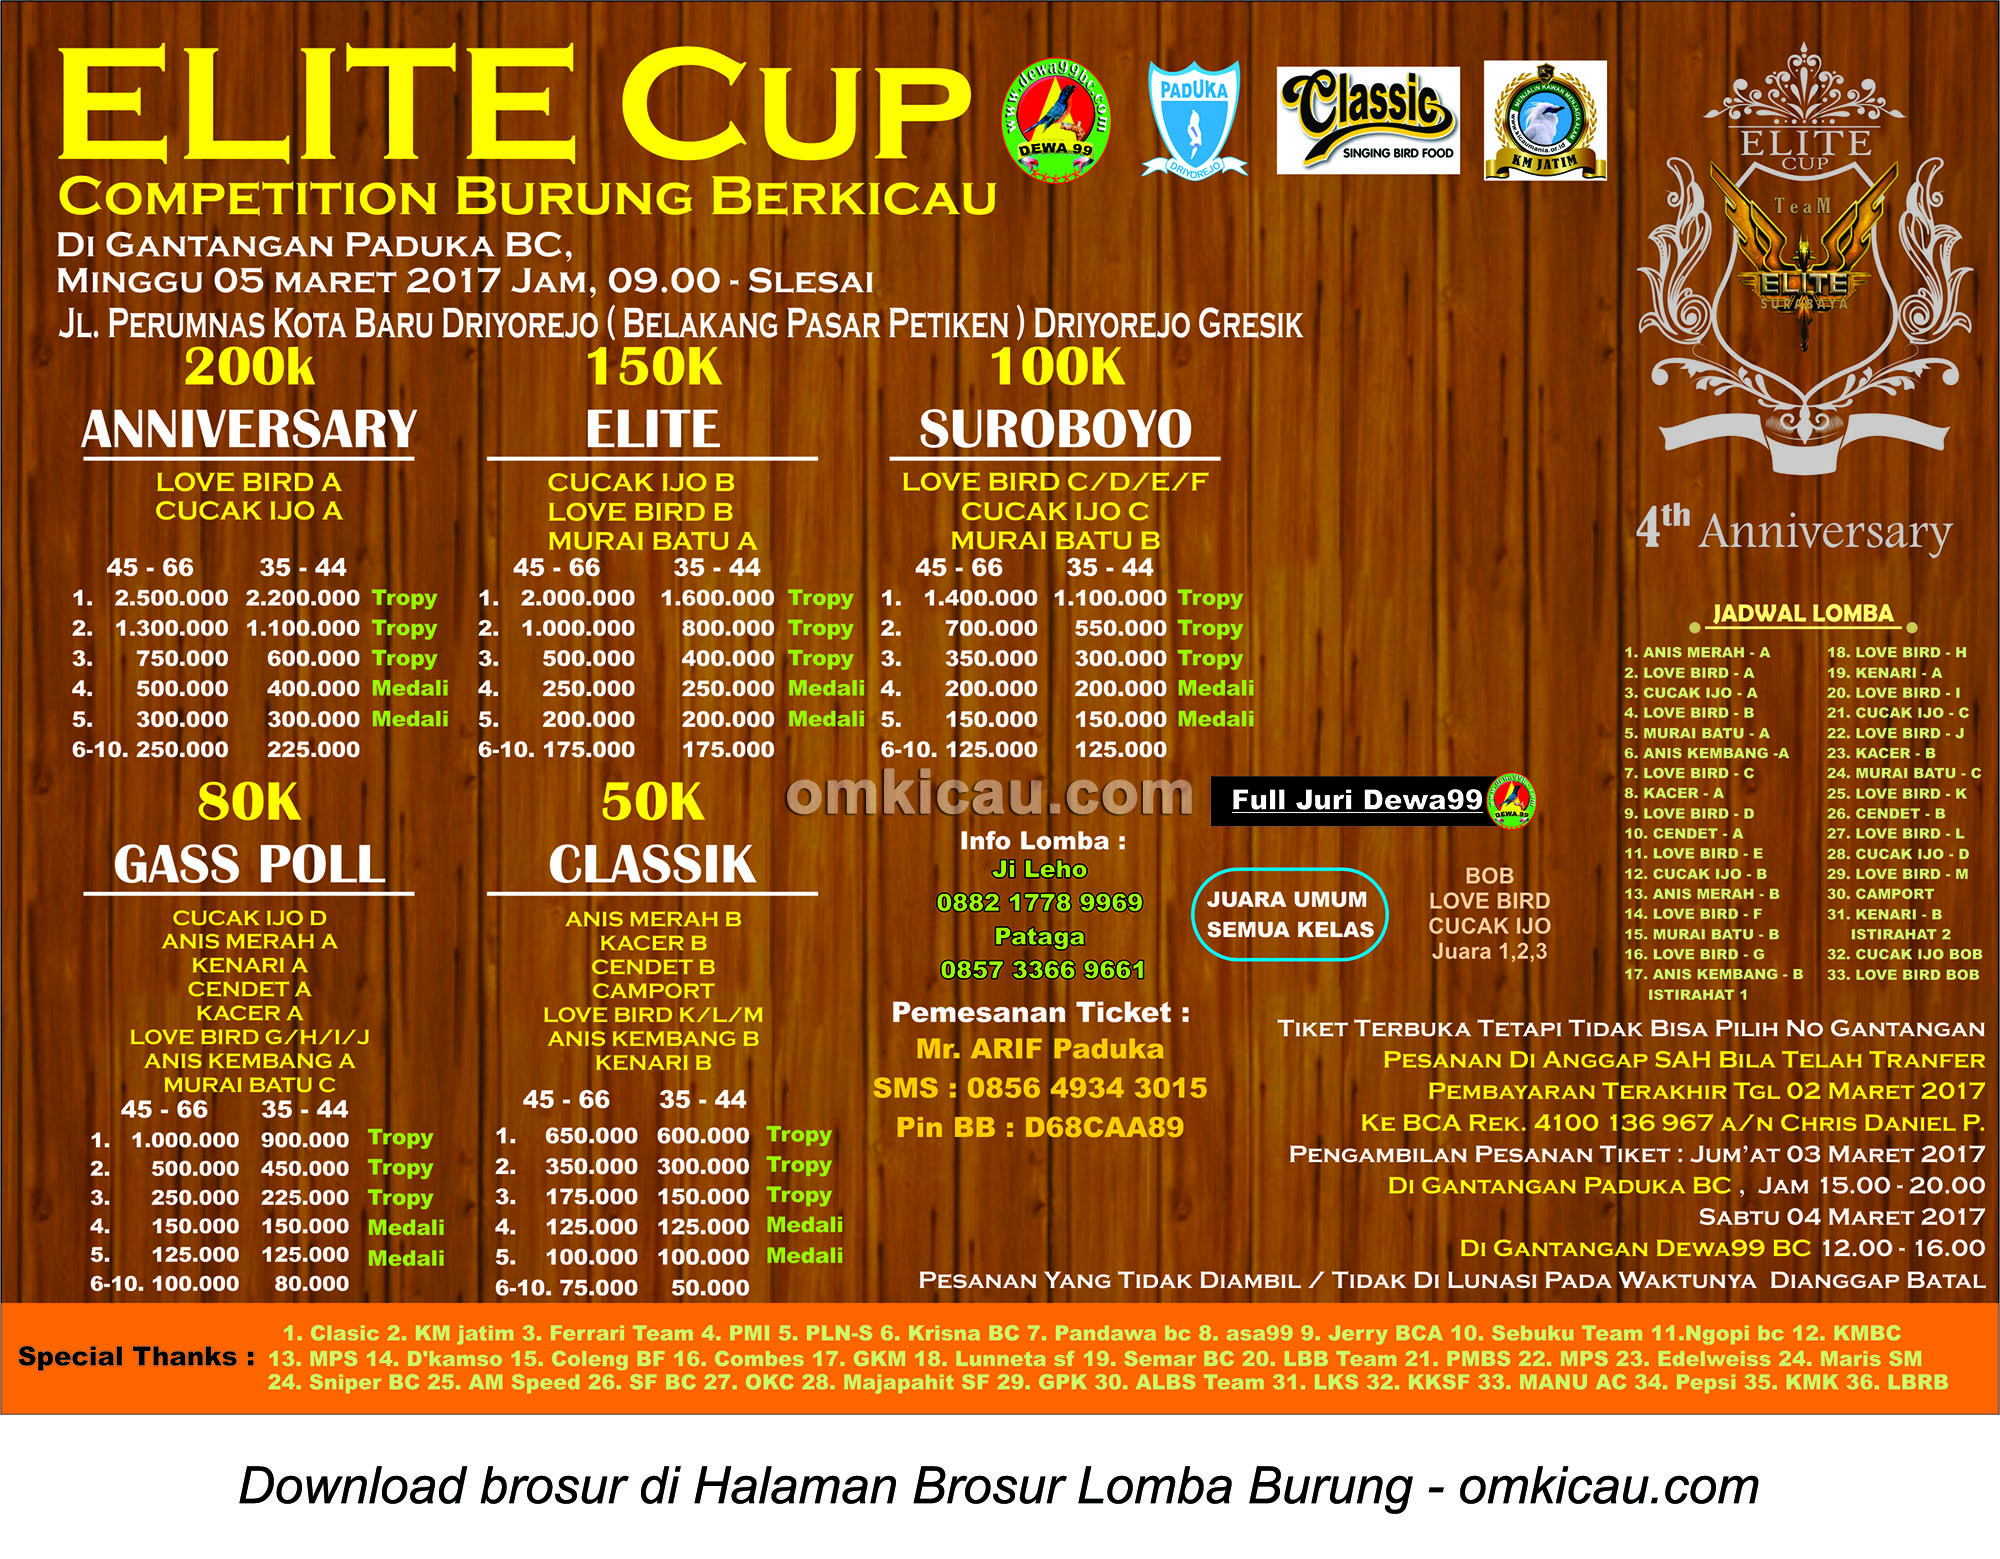 Brosur Lomba Burung Berkicau Elite Cup, Gresik, 5 Maret 2017